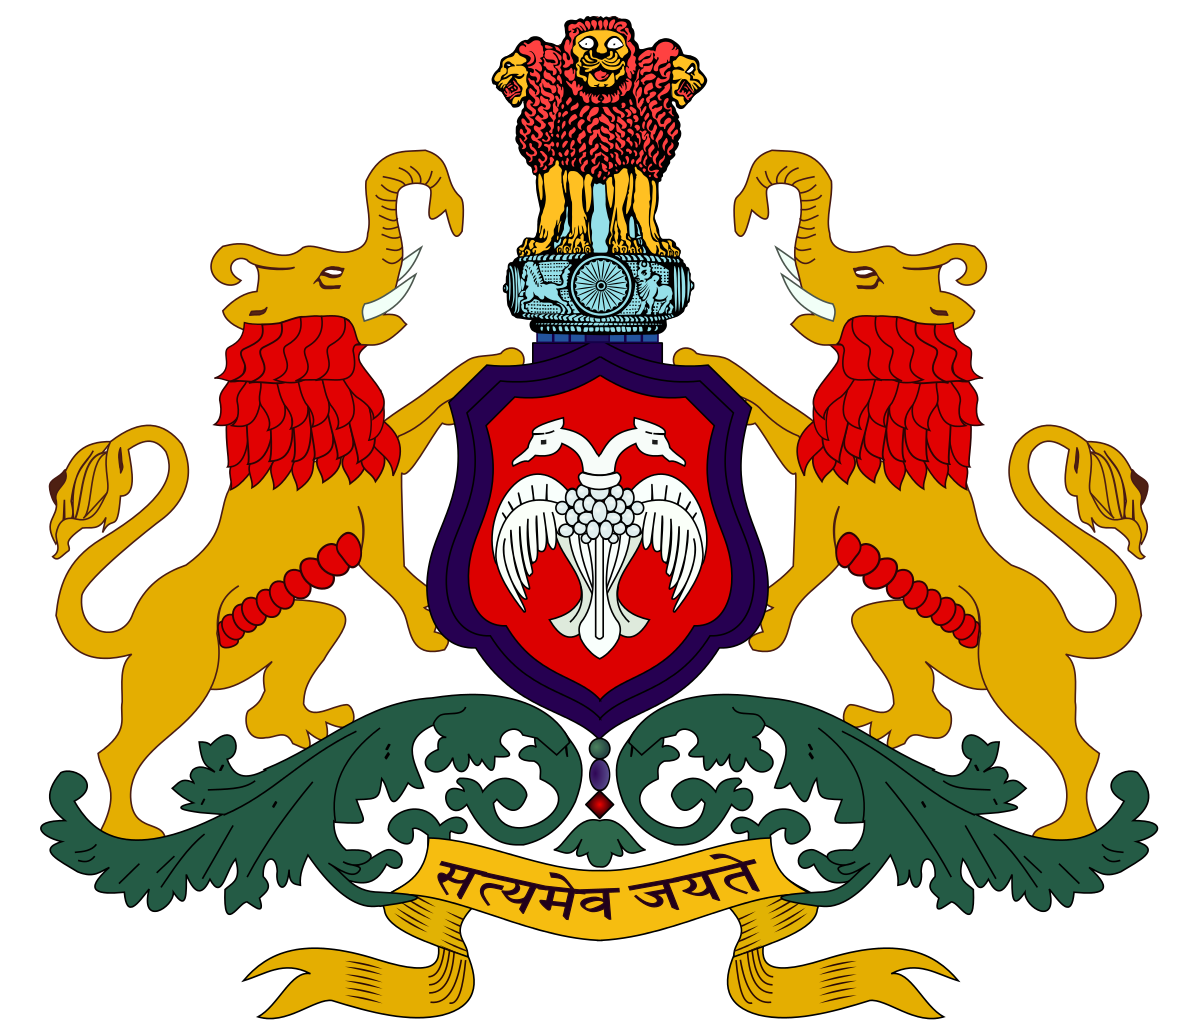 Karnataka Police PSI Physical Test Details 2019